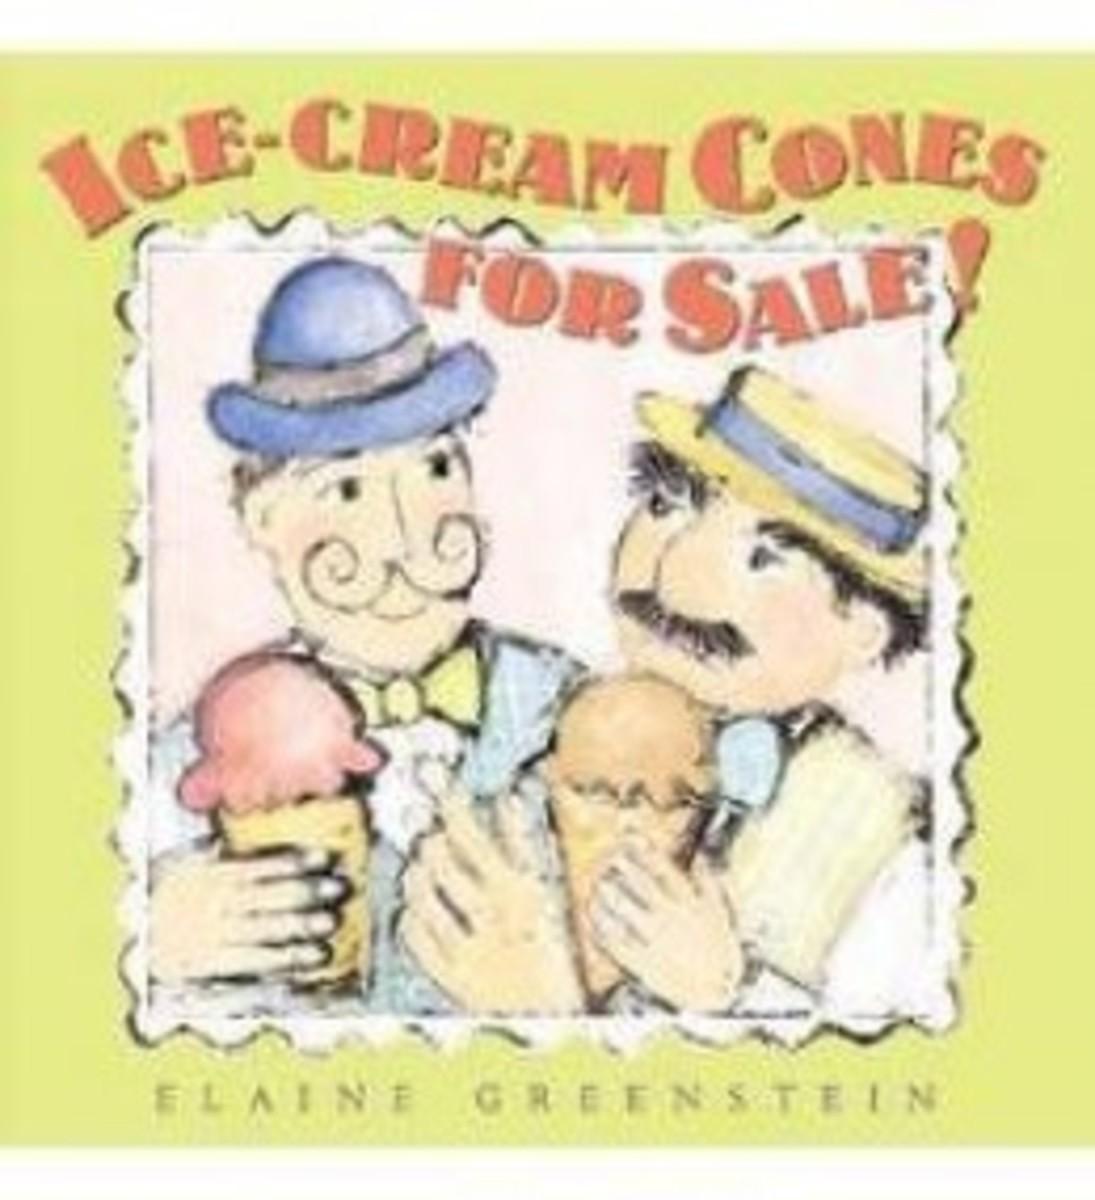 Ice Cream Cones For Sale! by Elaine Greenstein